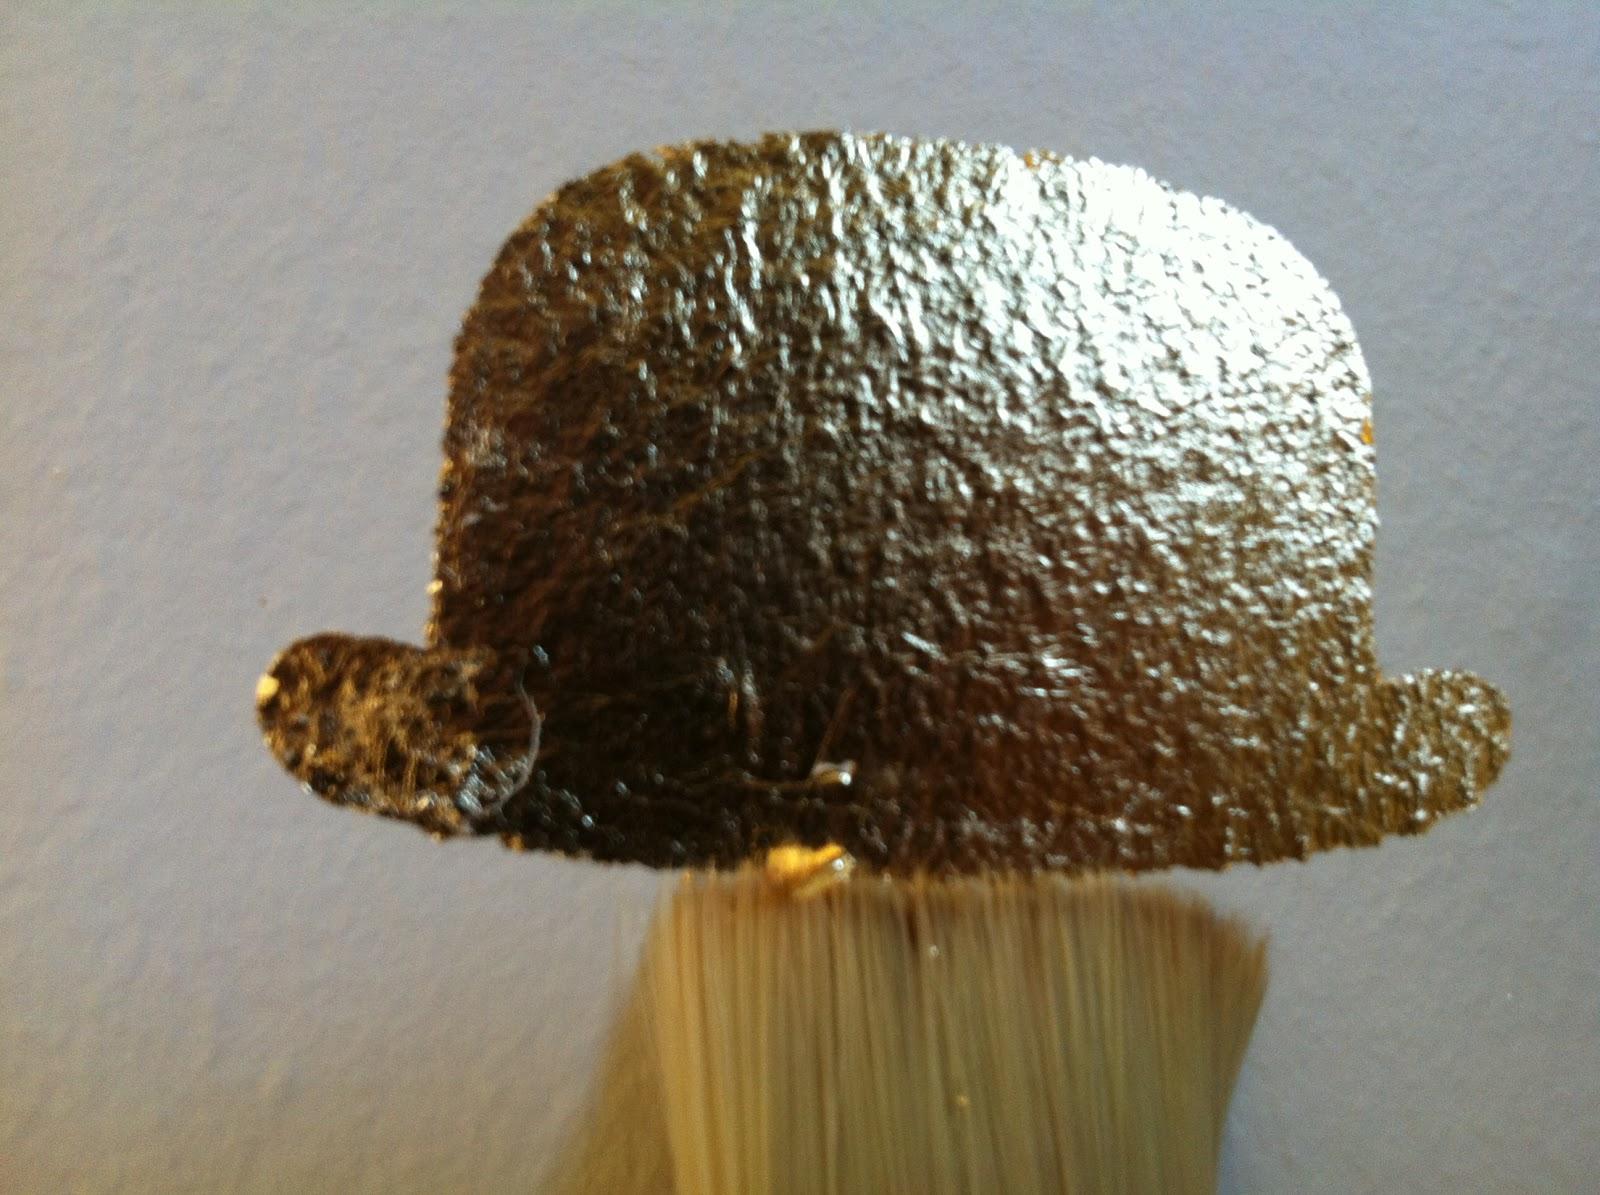 http://1.bp.blogspot.com/-nxTNlOFxzMo/UEeJwEd3HgI/AAAAAAAABkk/2u4YeST7ts0/s1600/12+Golden+bowlerhat+wallpaper.JPG